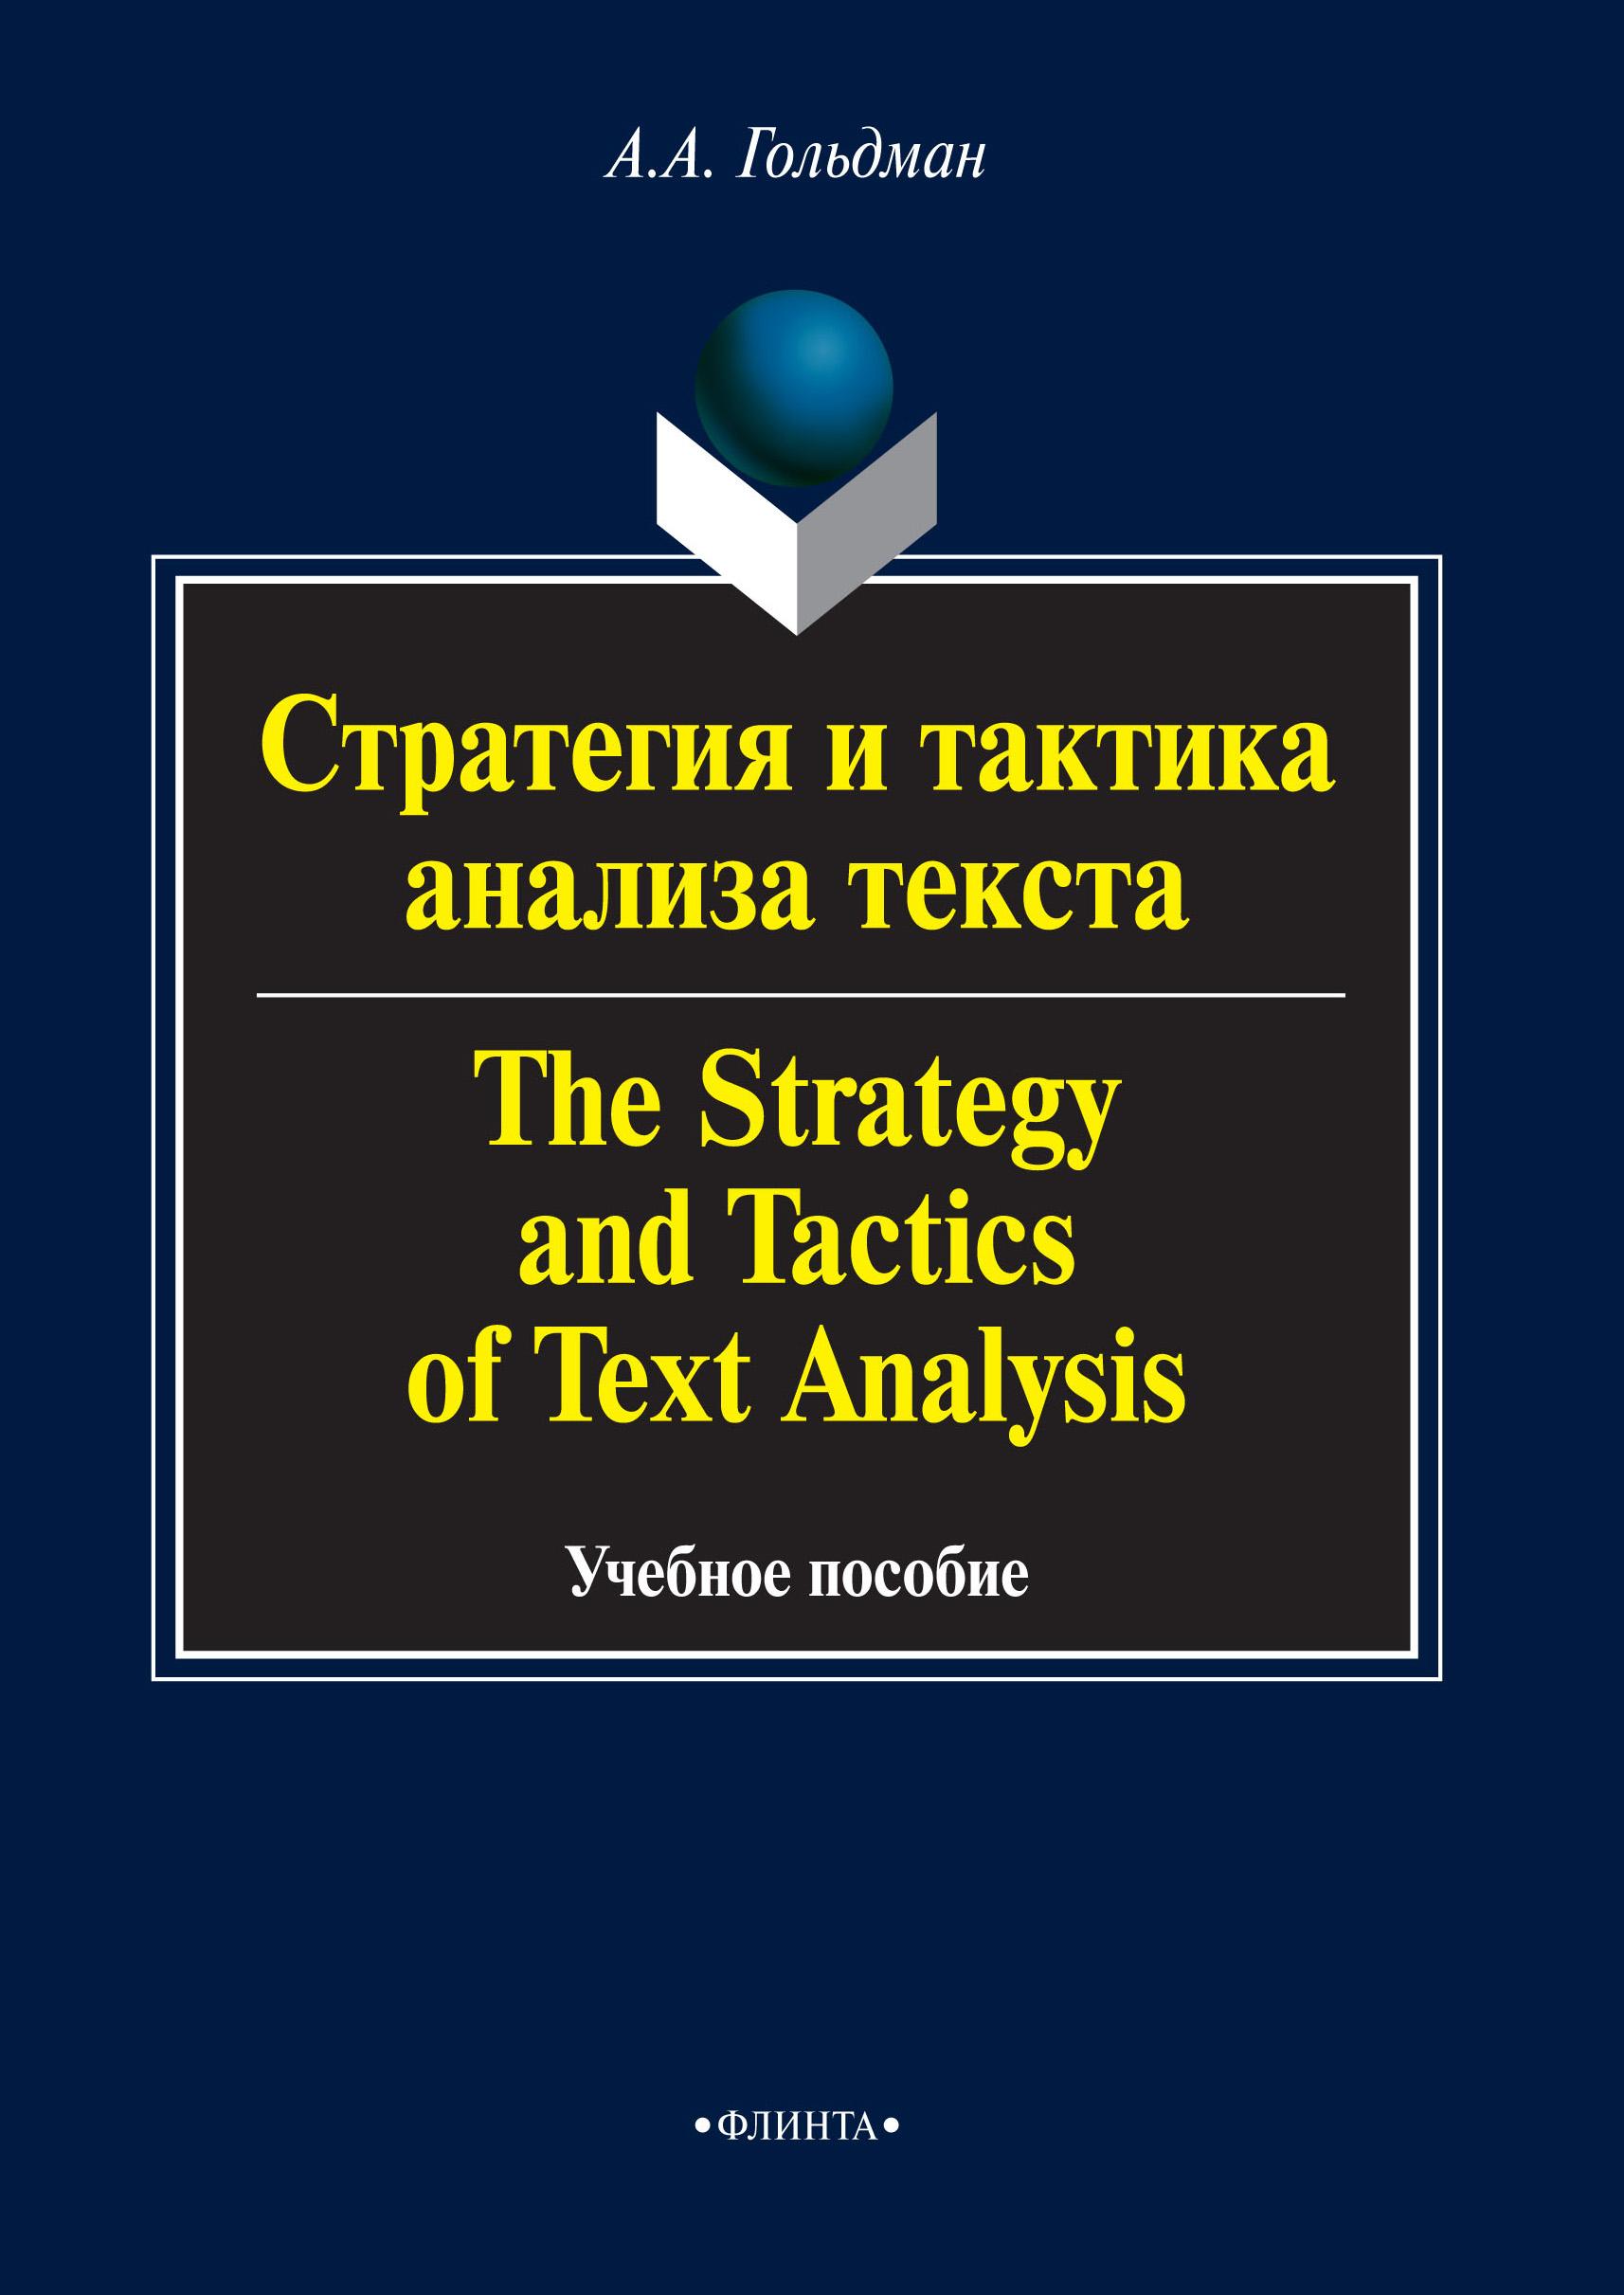 А. А. Гольдман Стратегия и тактика анализа текста / The Strategy and Tactics of Text Analysis. Учебное пособие